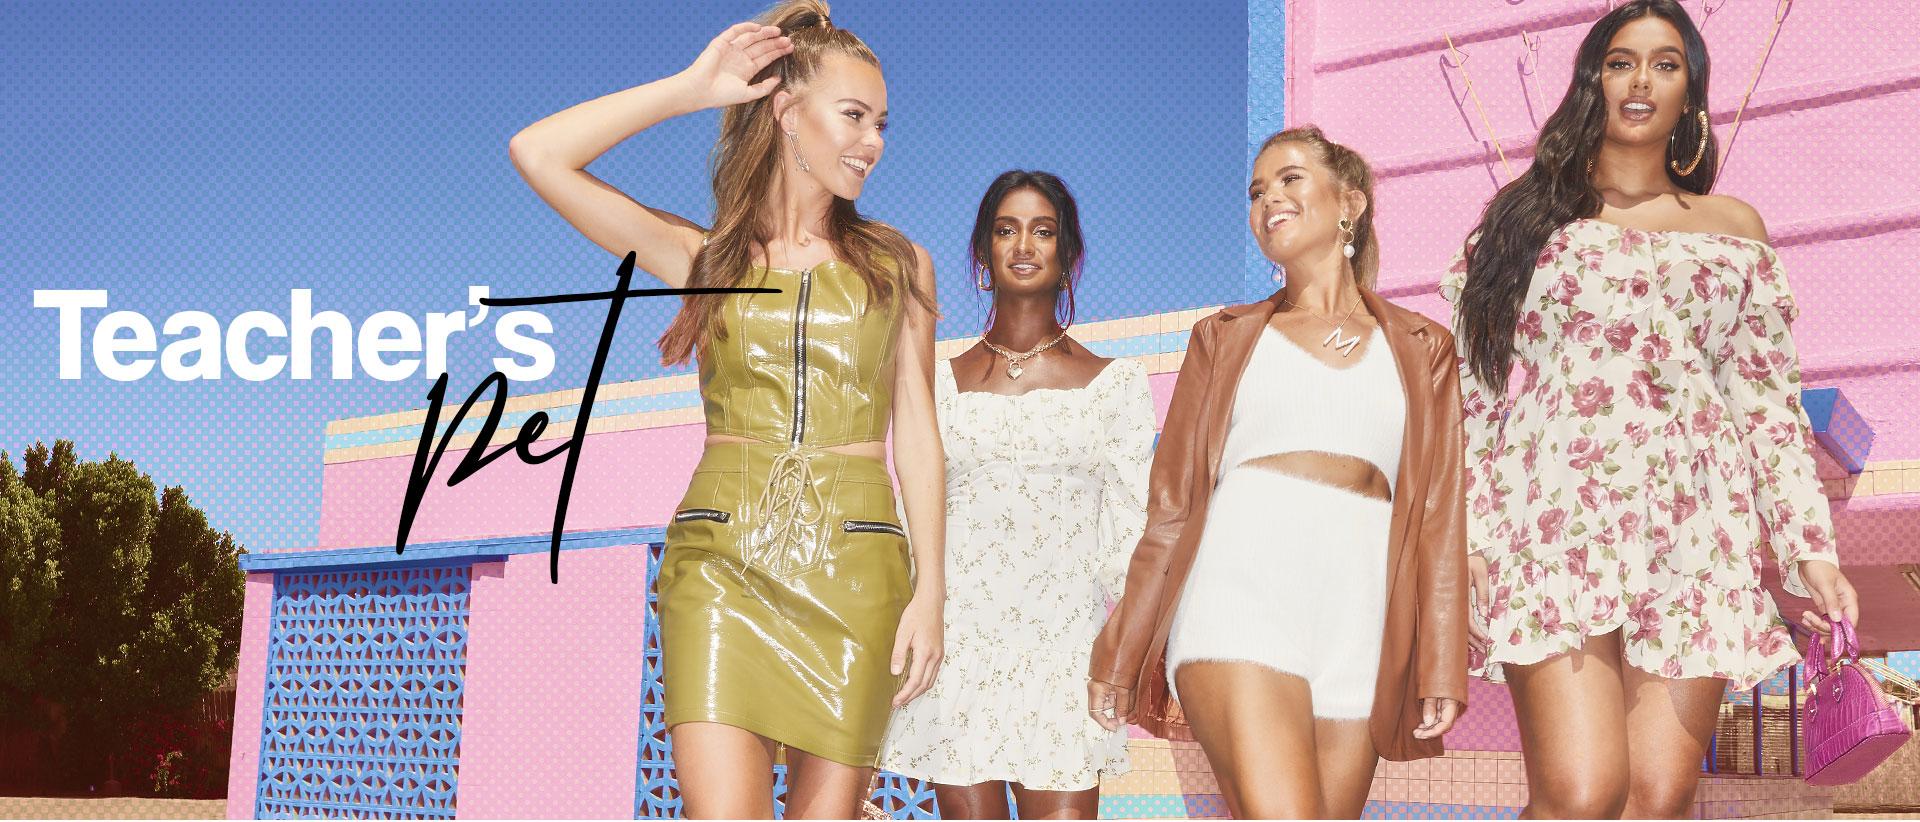 bb7587646d9 Clothes | Women's & Men's Clothing & Fashion | Online Shopping – boohoo